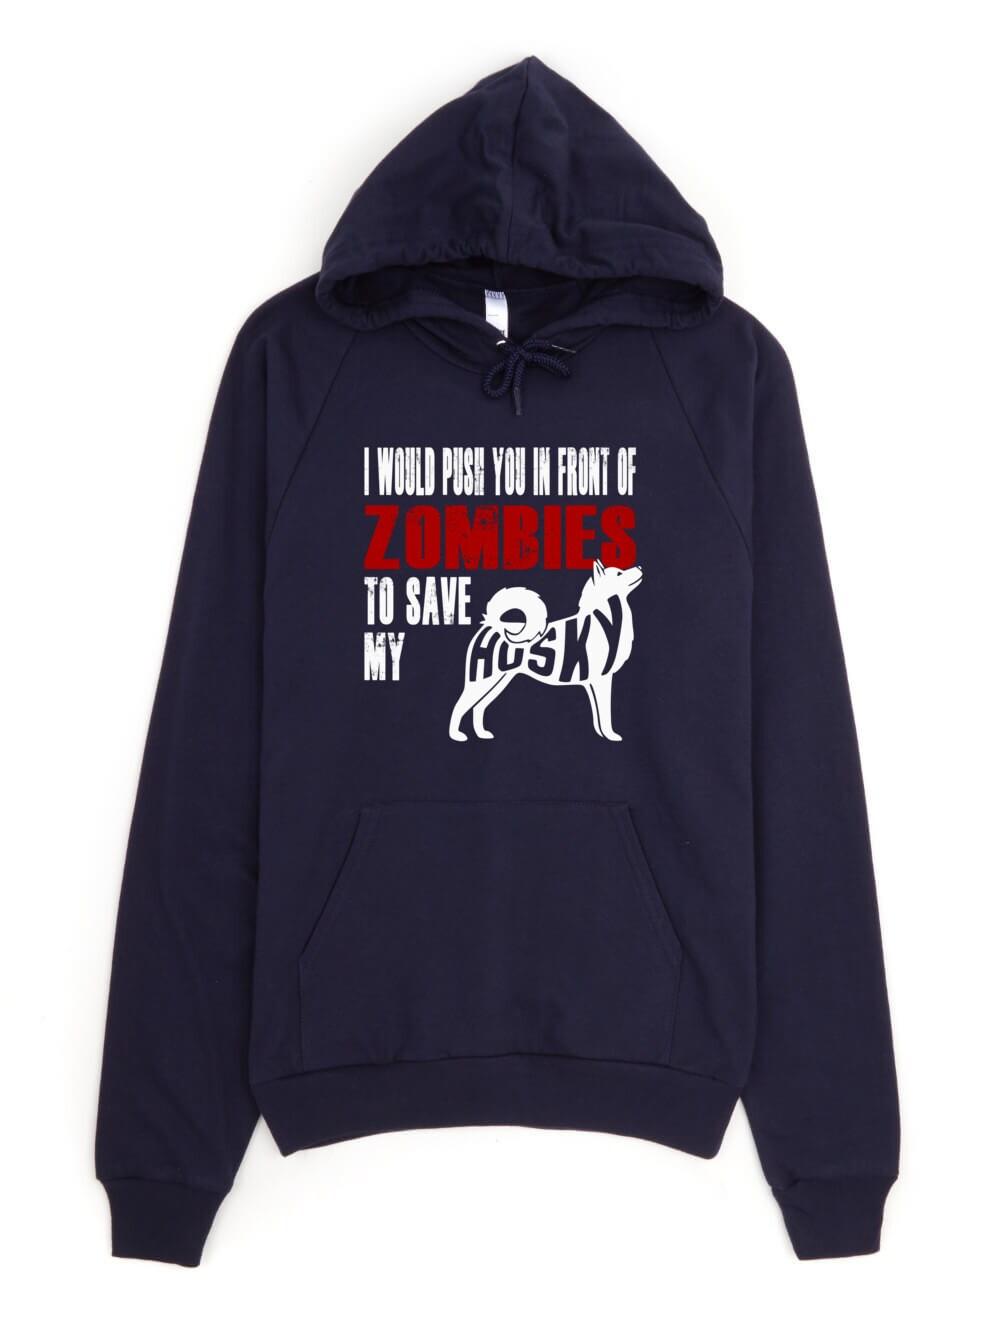 Husky Sweatshirt - I Would Push You In Front Of Zombies To Save My Husky - My Dog Husky Hoodie